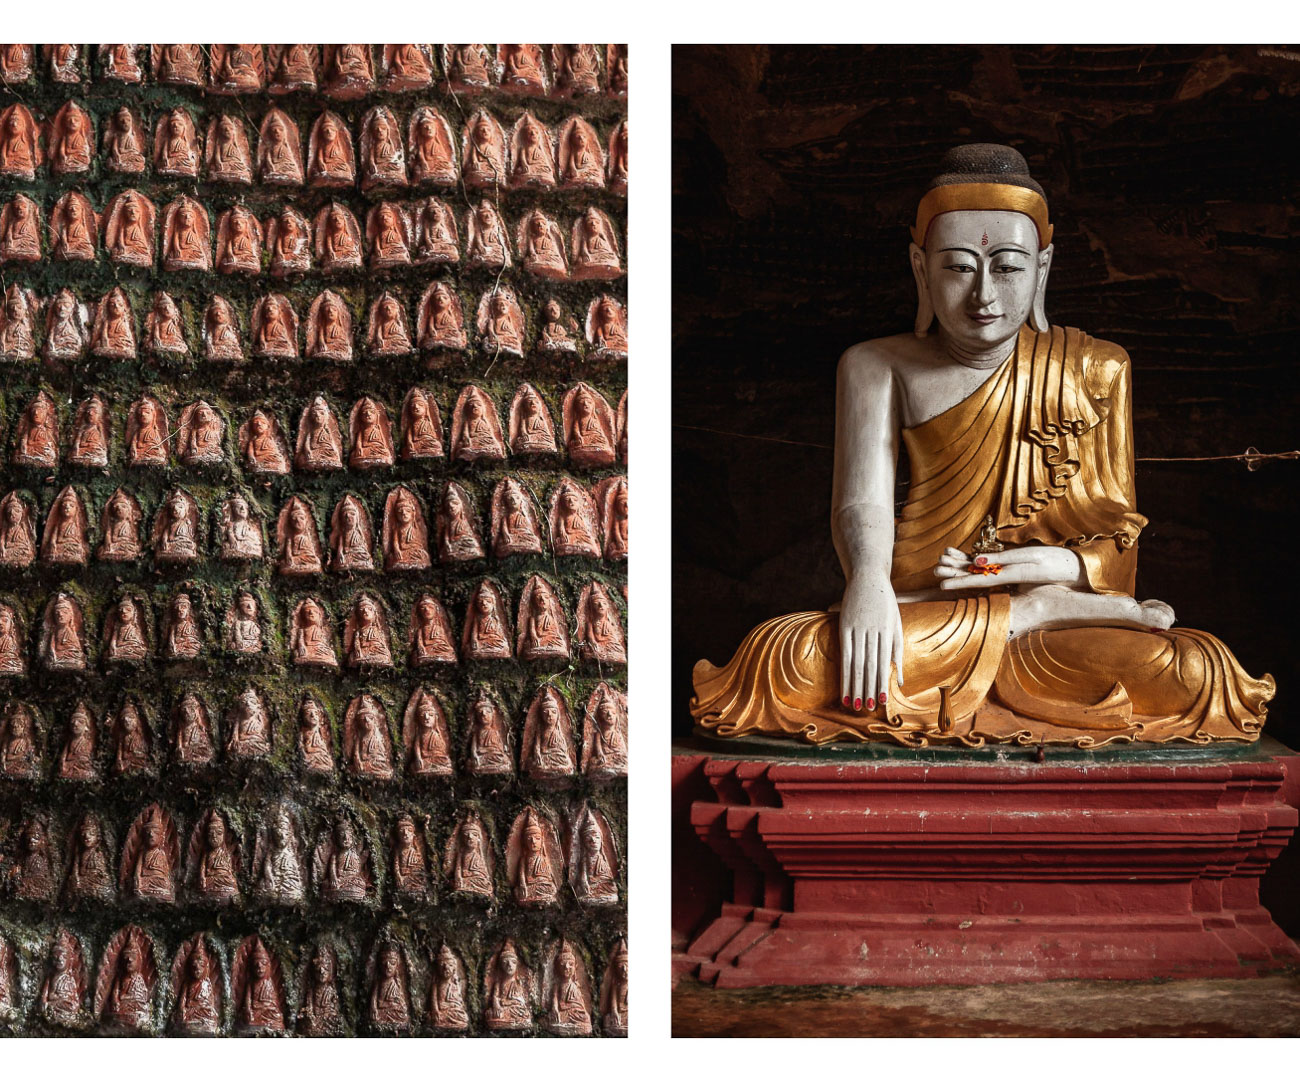 birma hpa-an